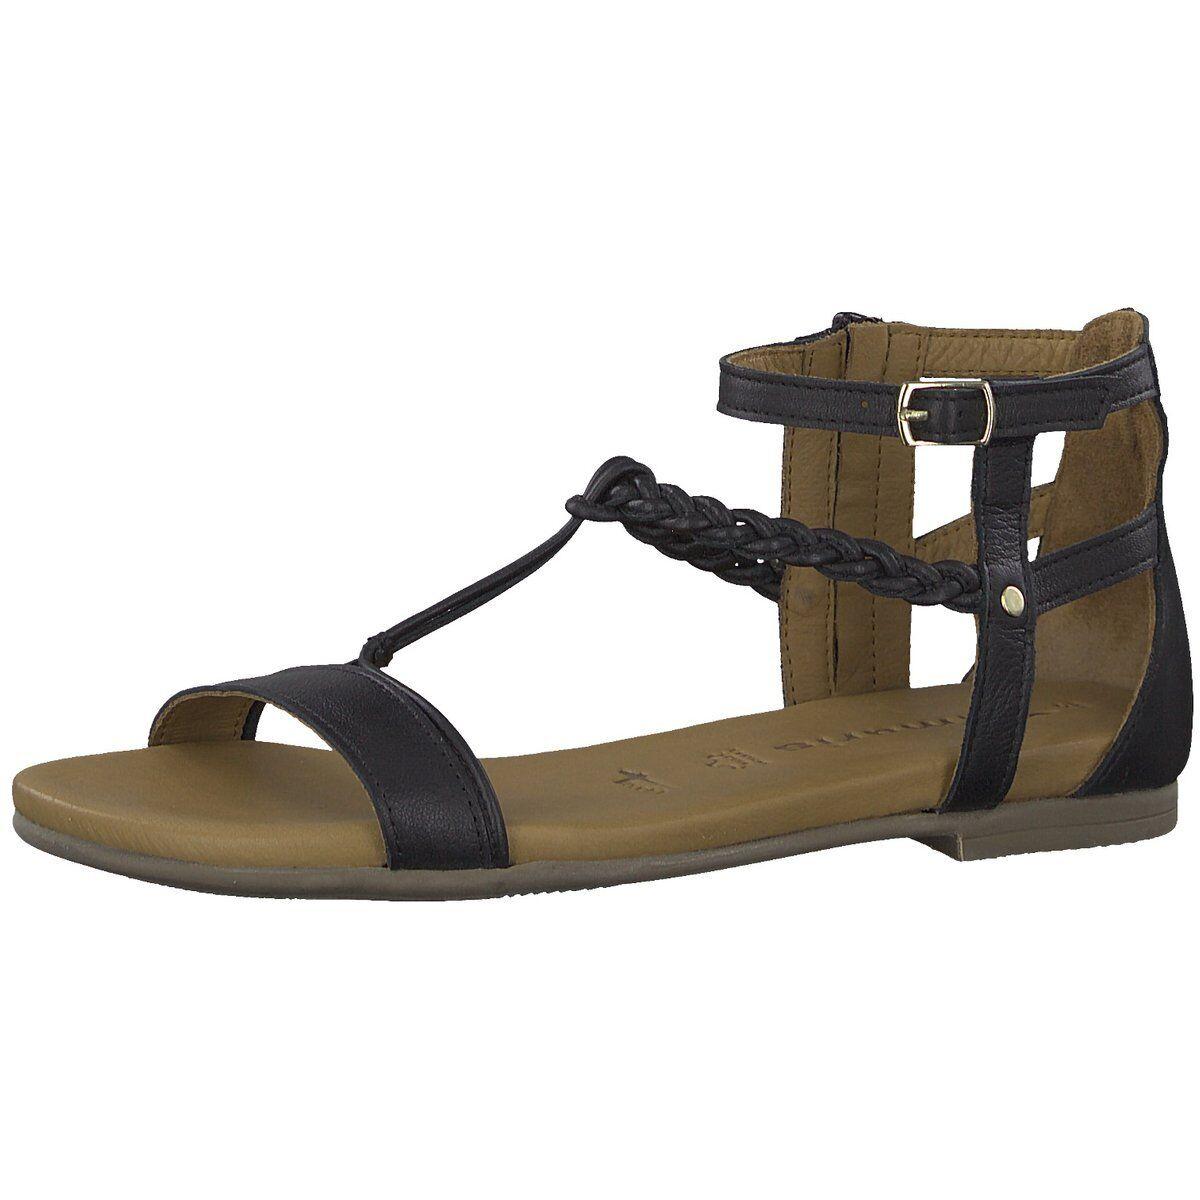 Tamaris Damen Sandaletten Woms Sandals 1-1-28043-22 007-007 schwarz 606104